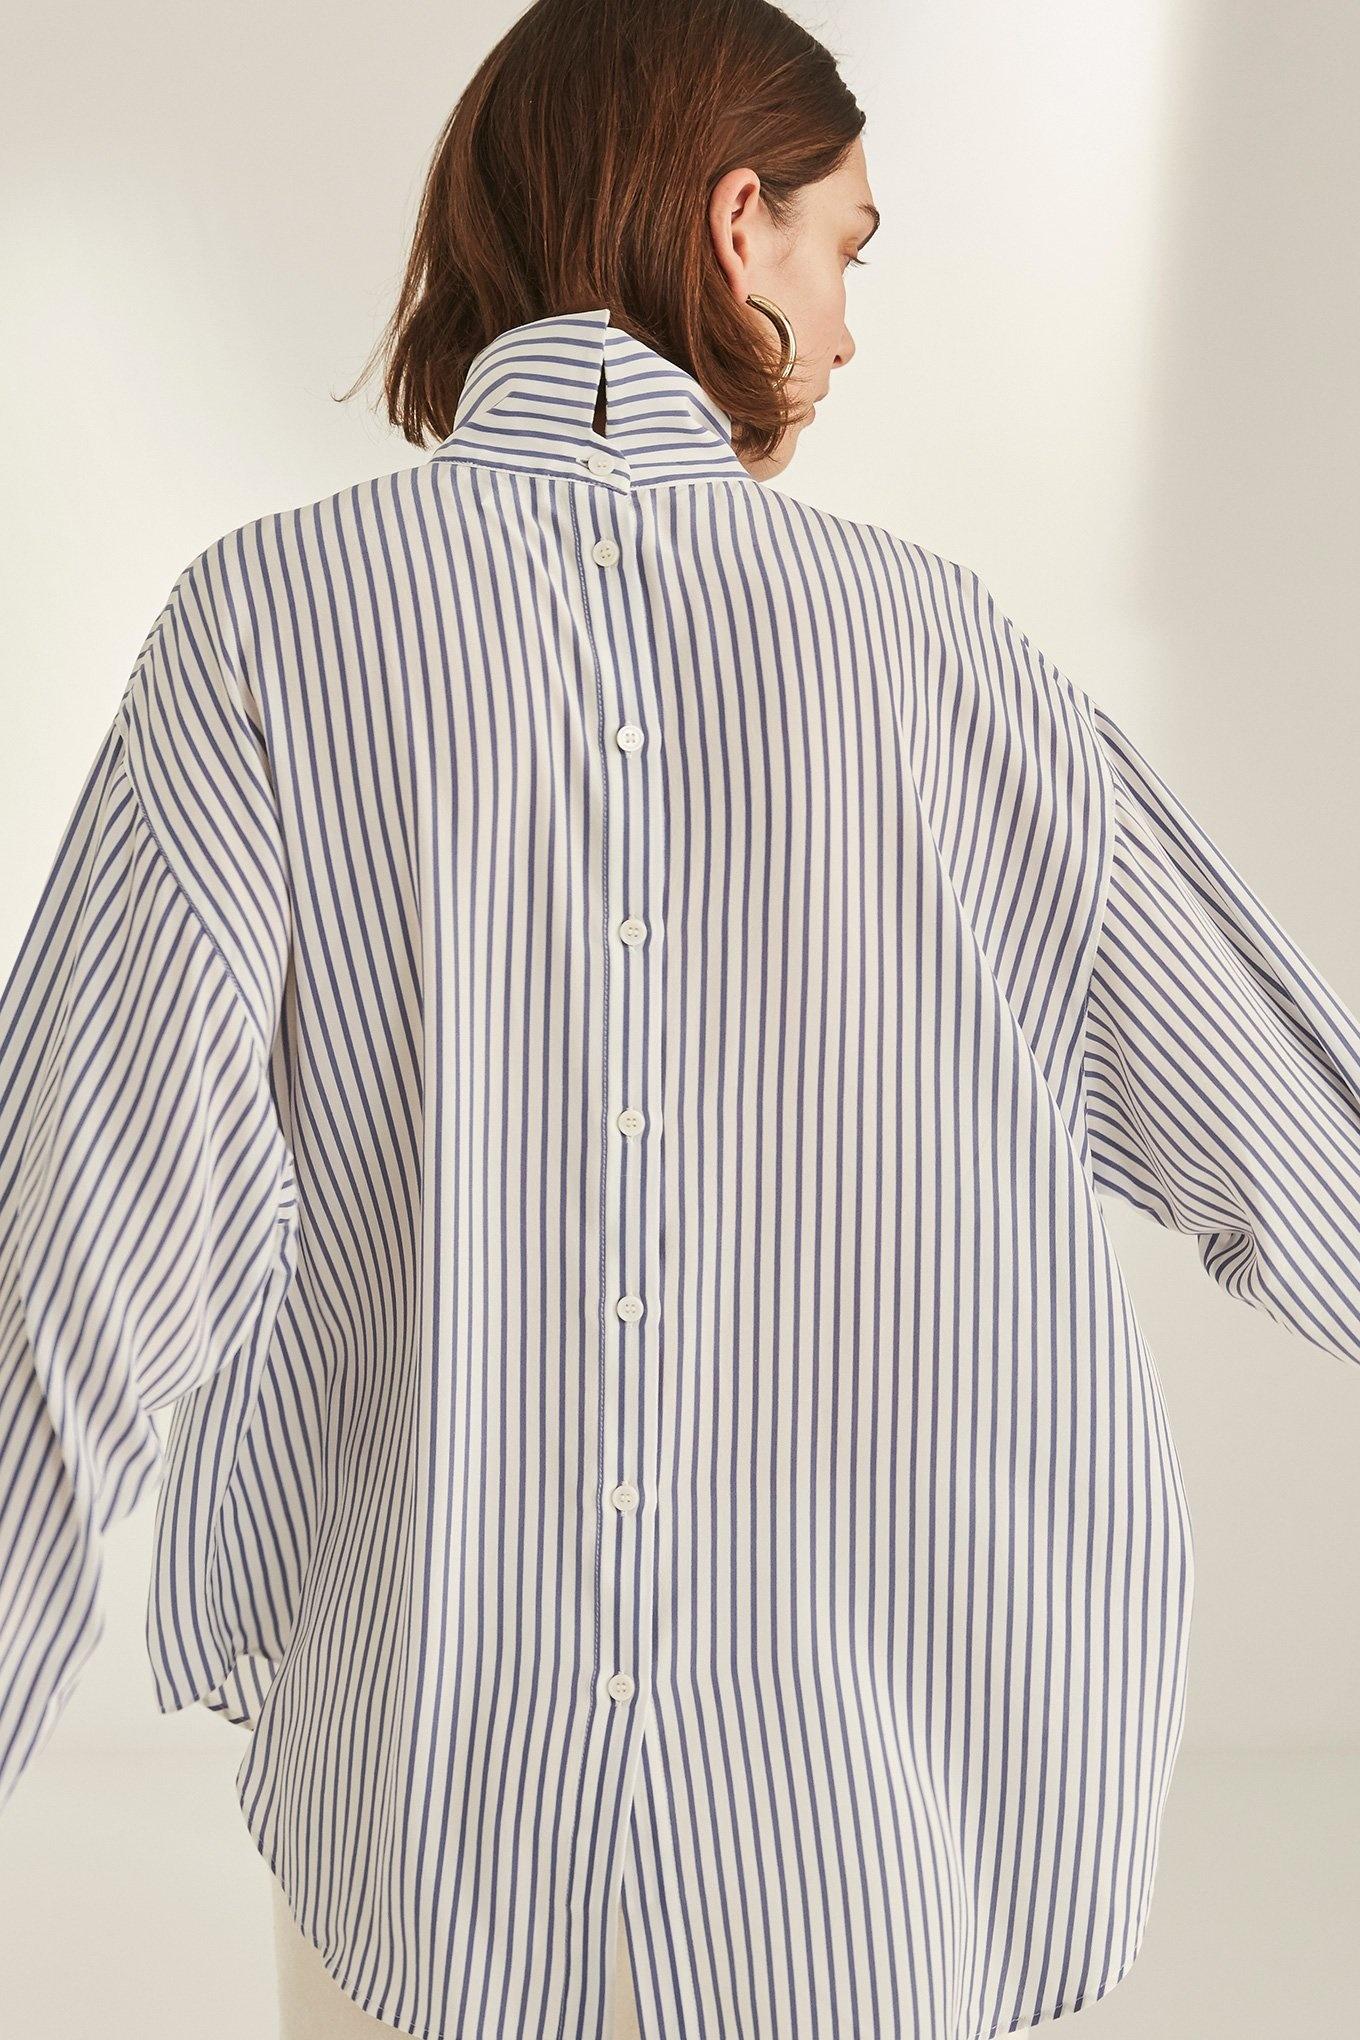 Vallie blouse Blue Stripe